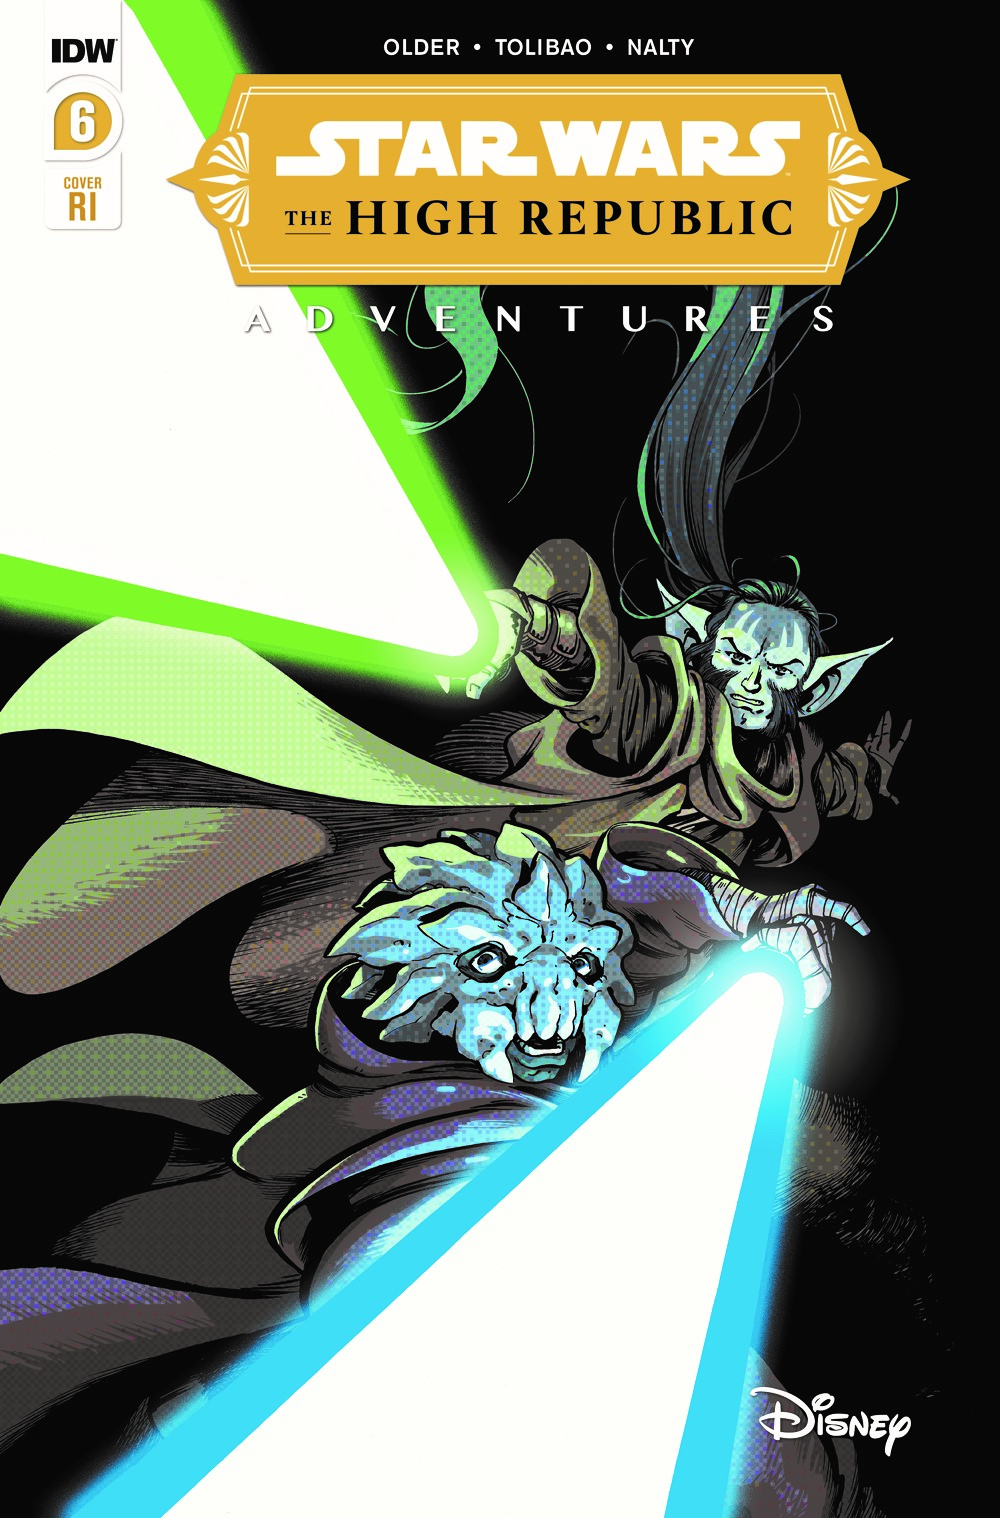 StarWarsHighRepublic-06-RI ComicList Previews: STAR WARS THE HIGH REPUBLIC ADVENTURES #6